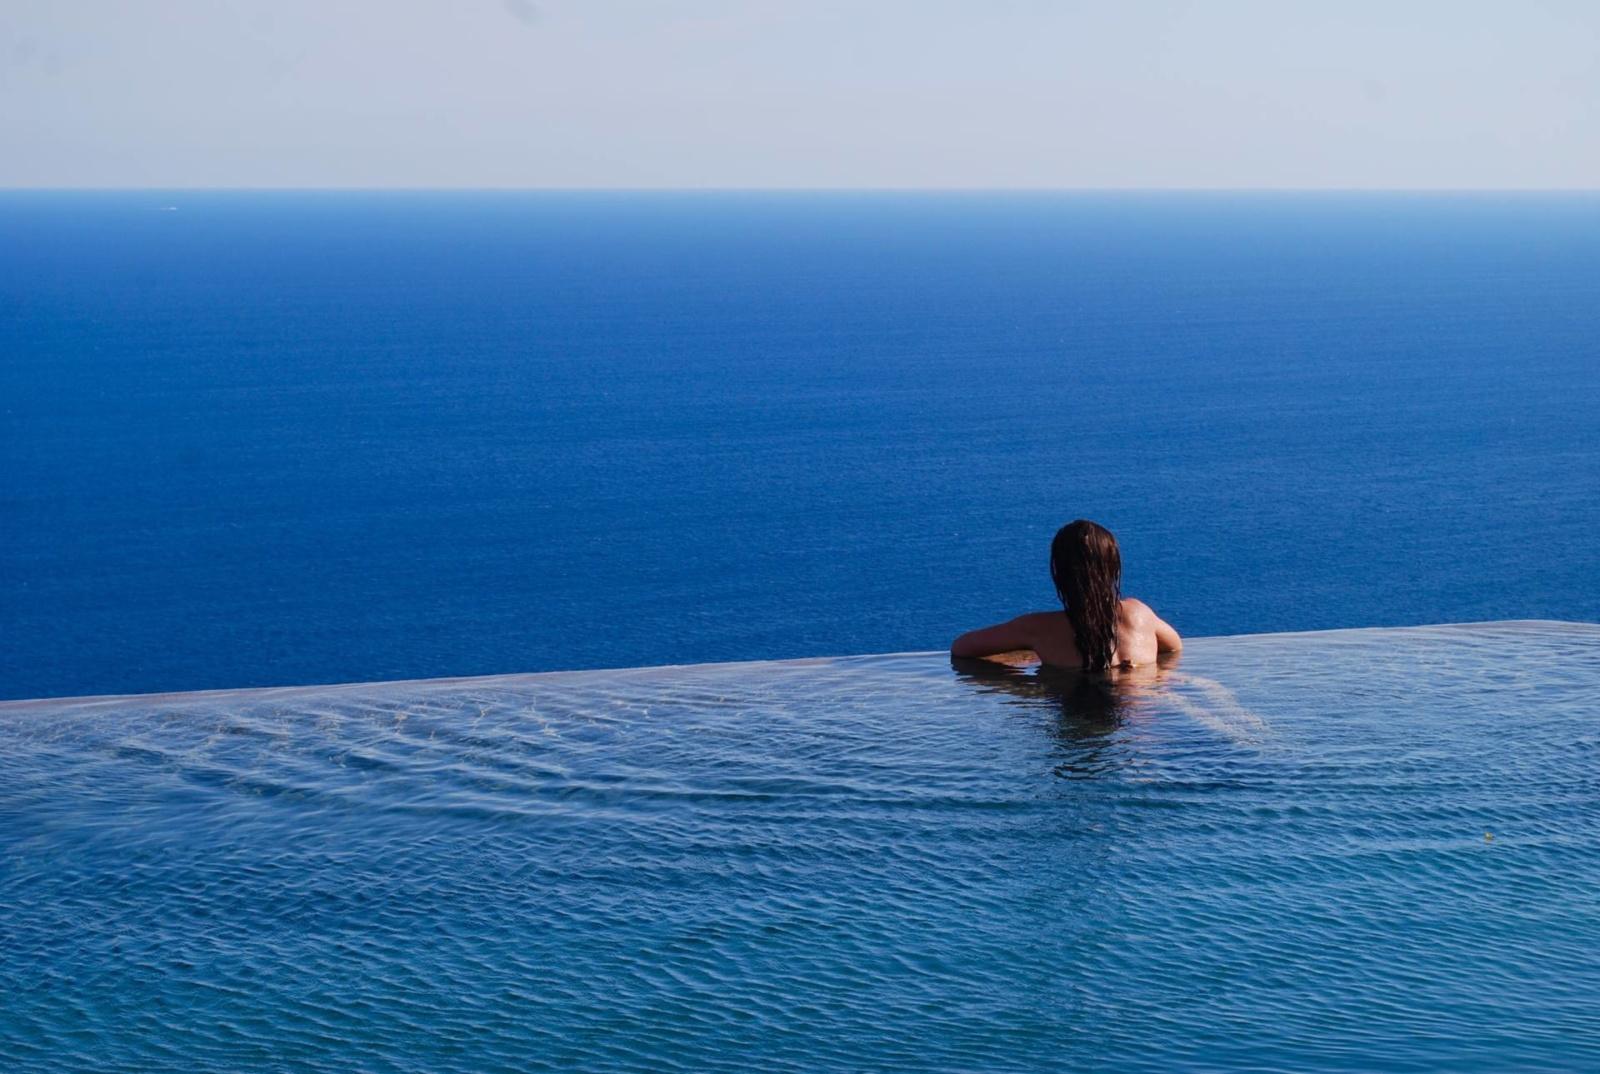 monastero-santa-rosa-amalfi-review-infinity-pool